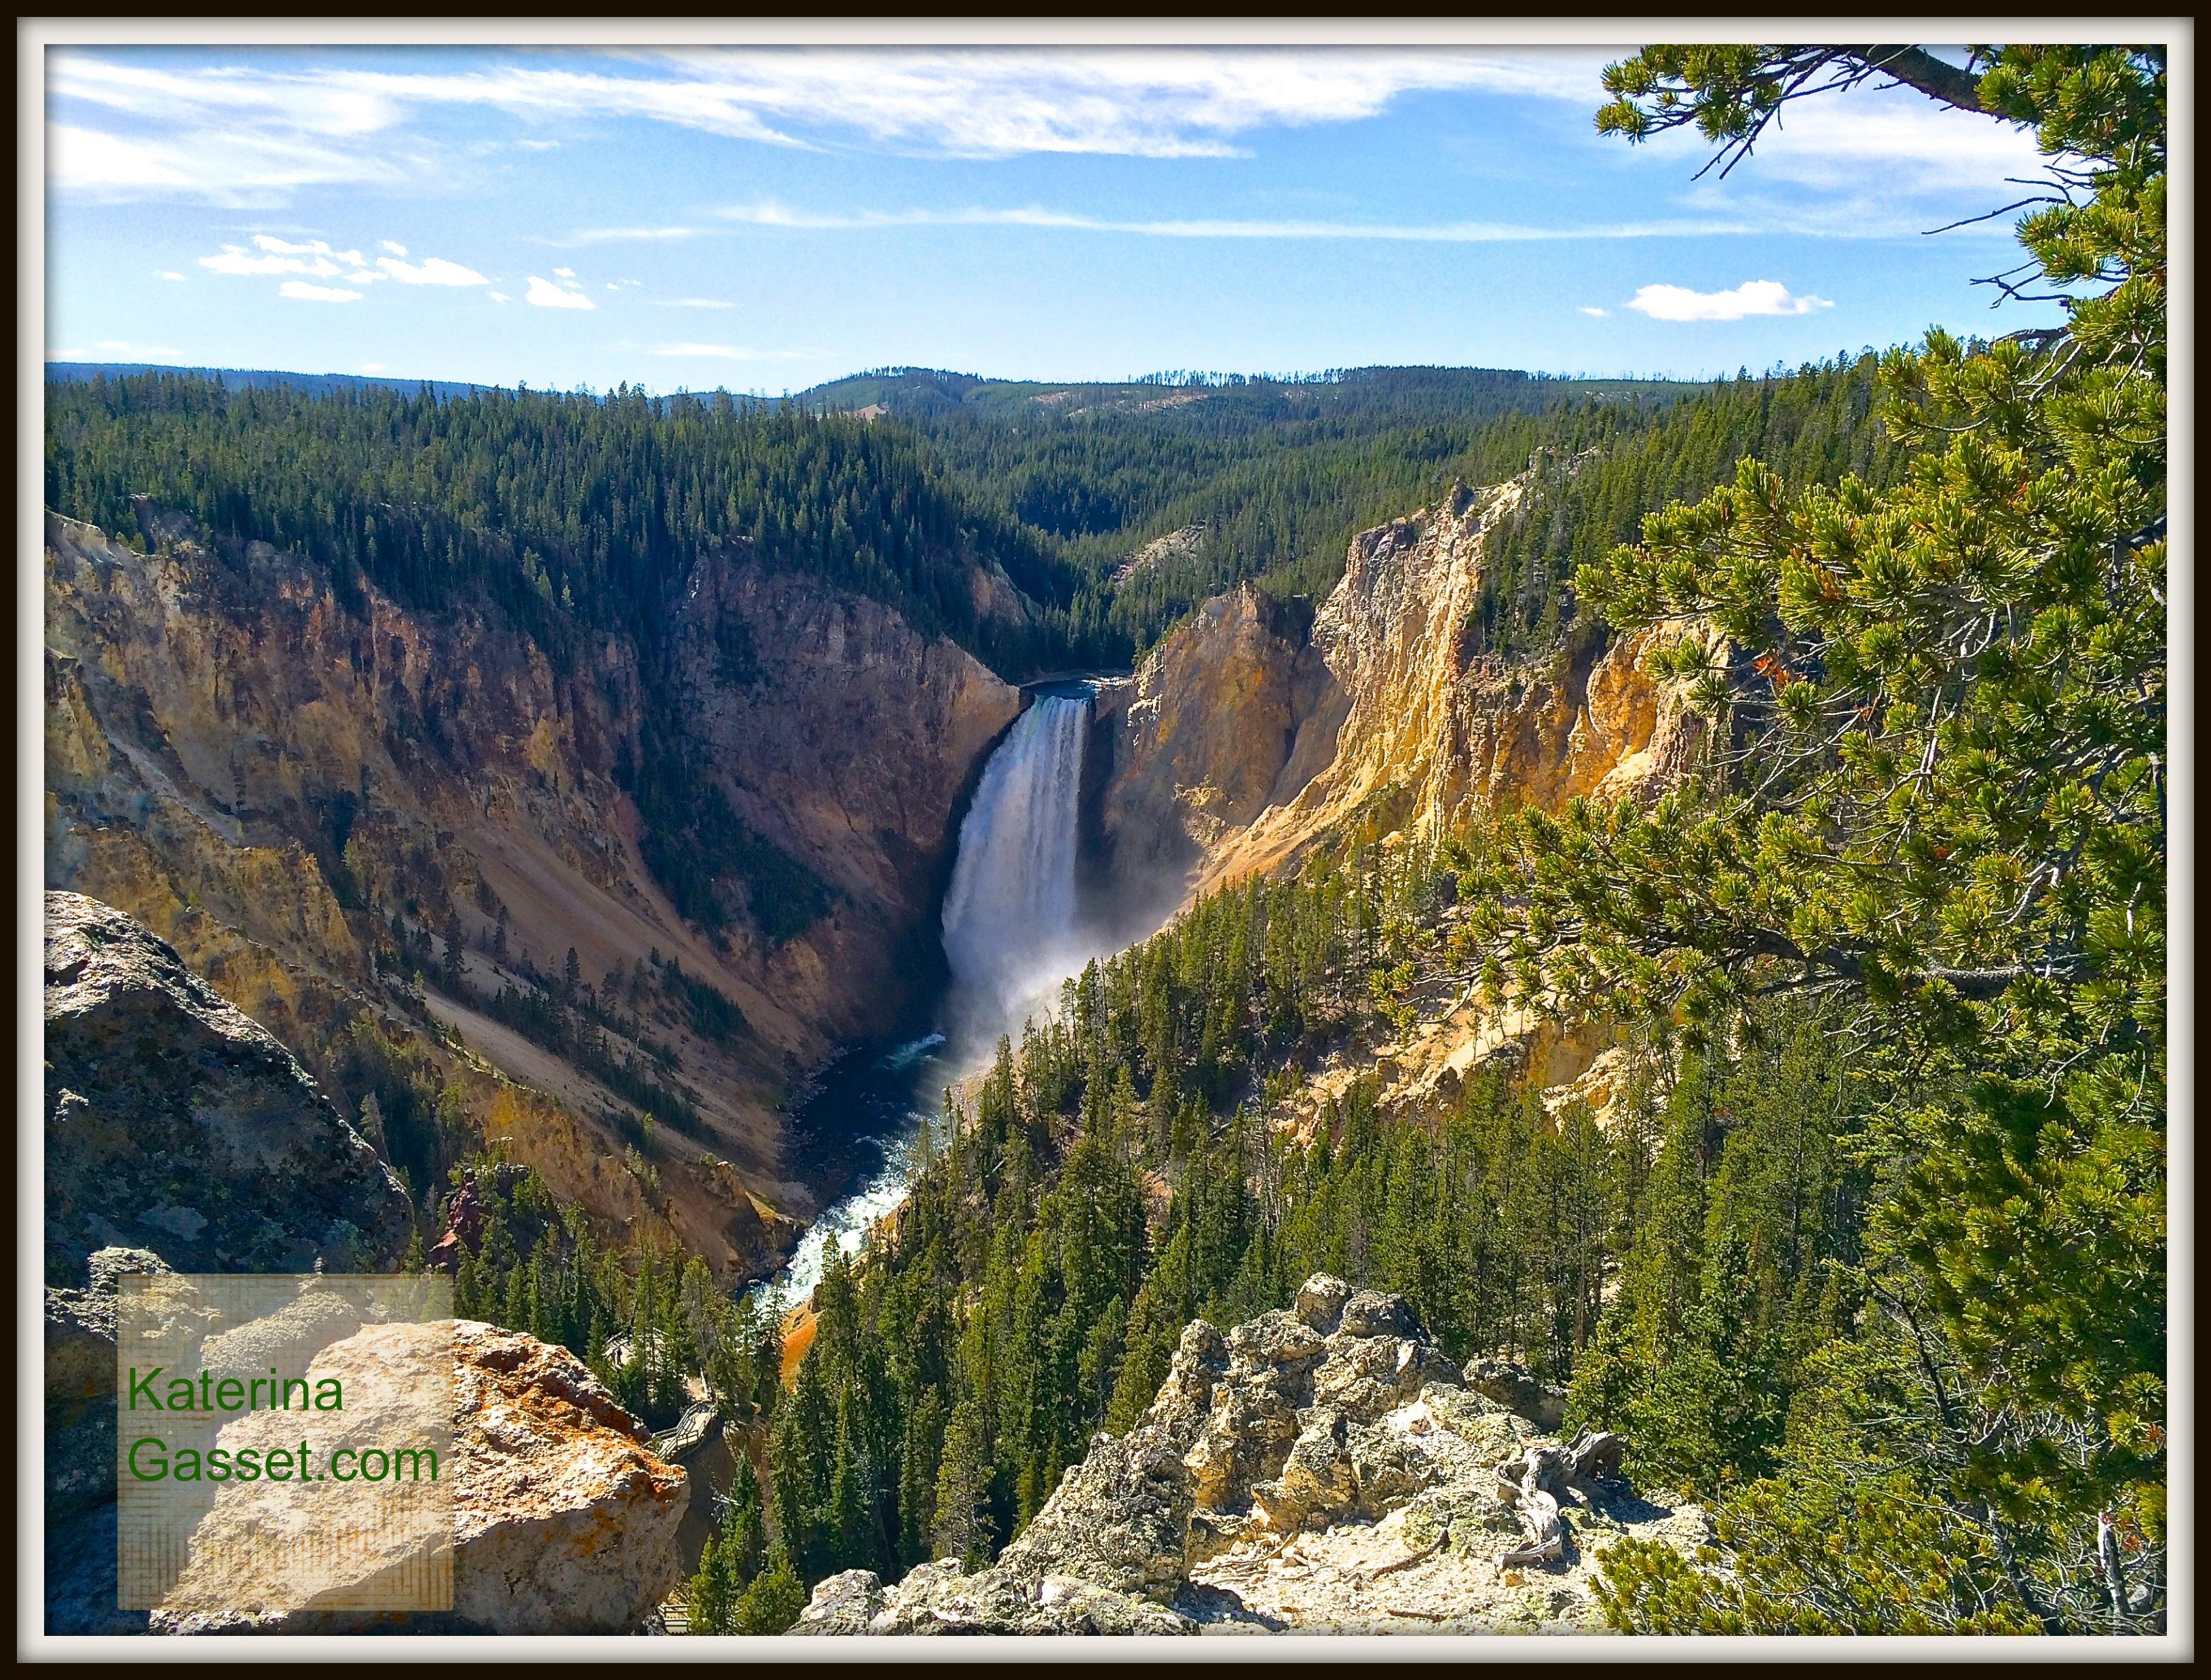 Yellowstone Falls Wyoming Gasset Family